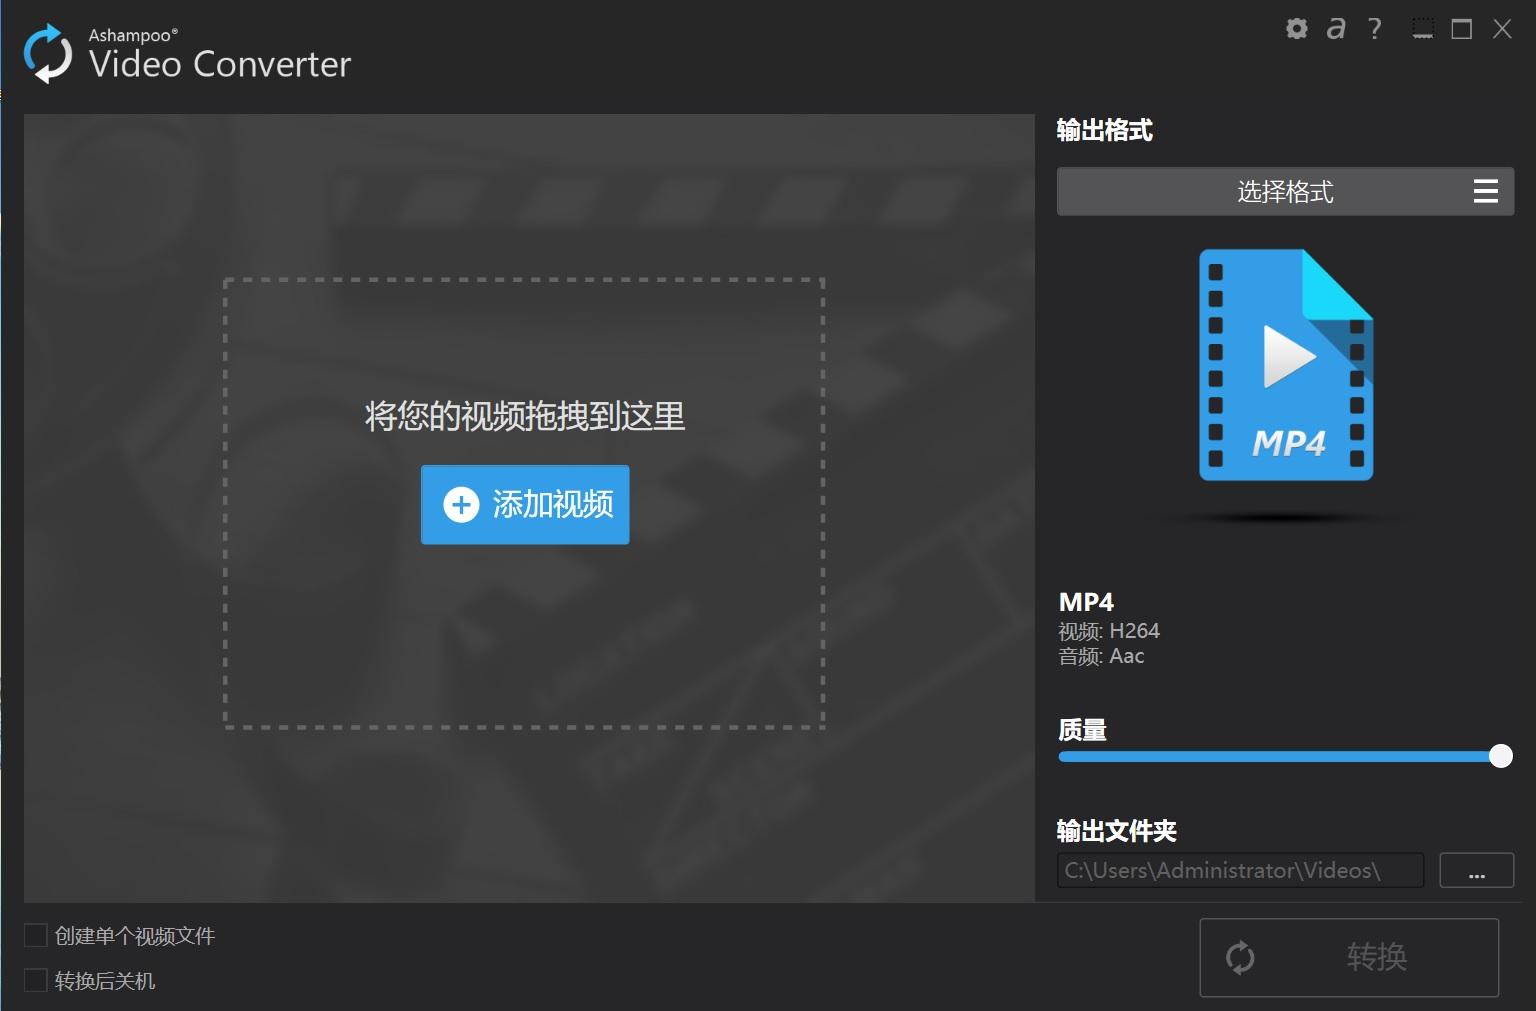 Ashampoo Video Converter.jpg